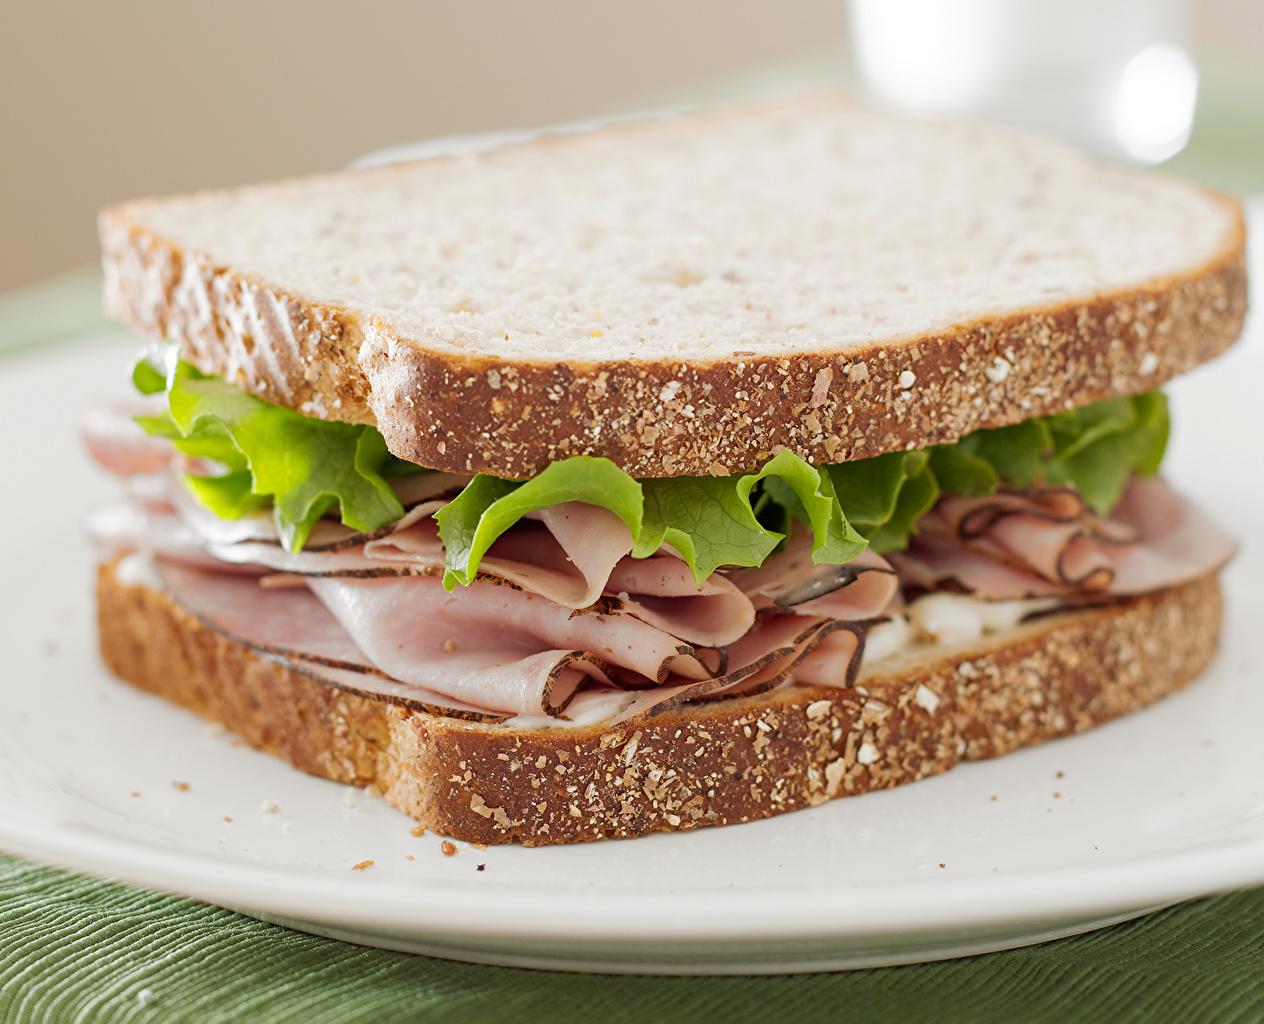 Фото Продукты питания Хлеб Фастфуд Ветчина Бутерброды Сэндвич Еда Пища бутерброд Быстрое питание